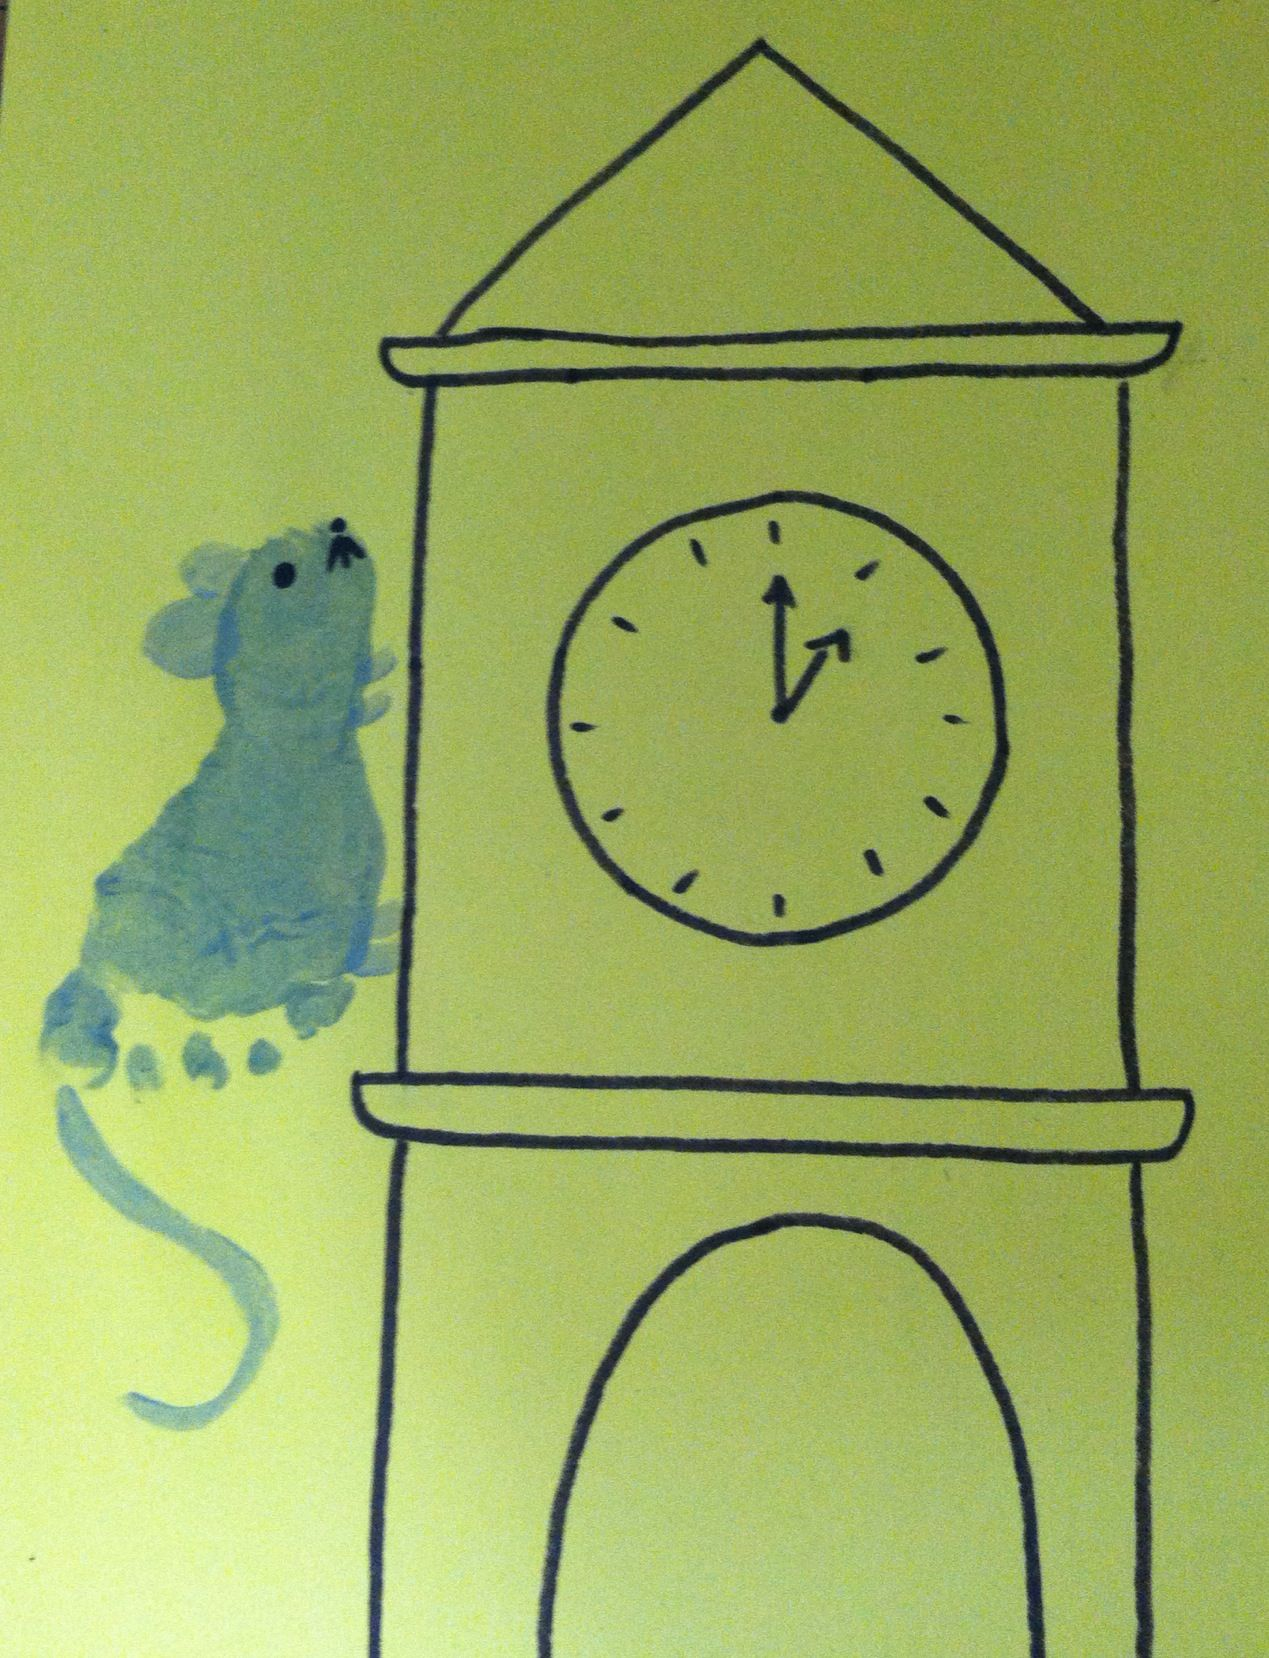 Foot-Print Nursery Rhyme Art - Hickory Dickory Dock | Footprint and ...